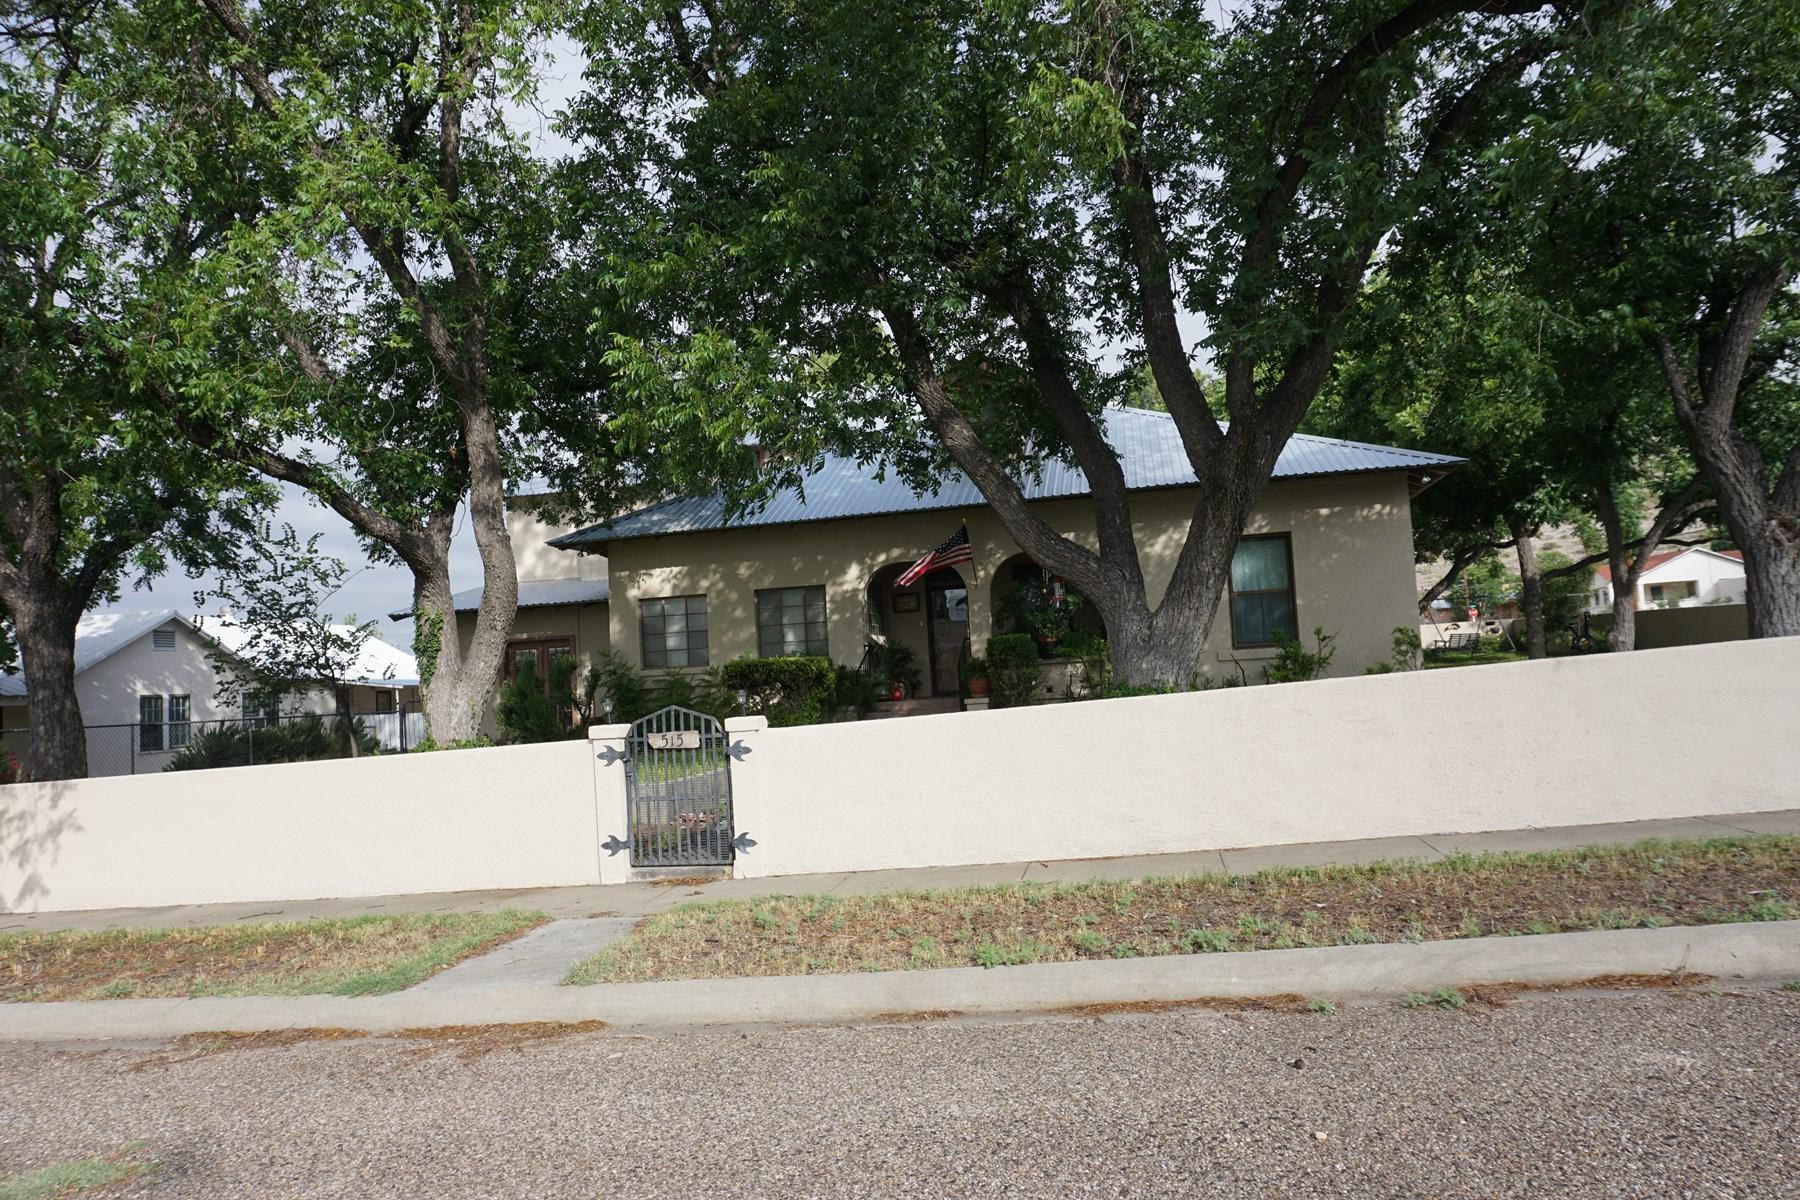 HISTORIC 5 BR 3 BA HOME FOR SALE IN SANDERSON, TX